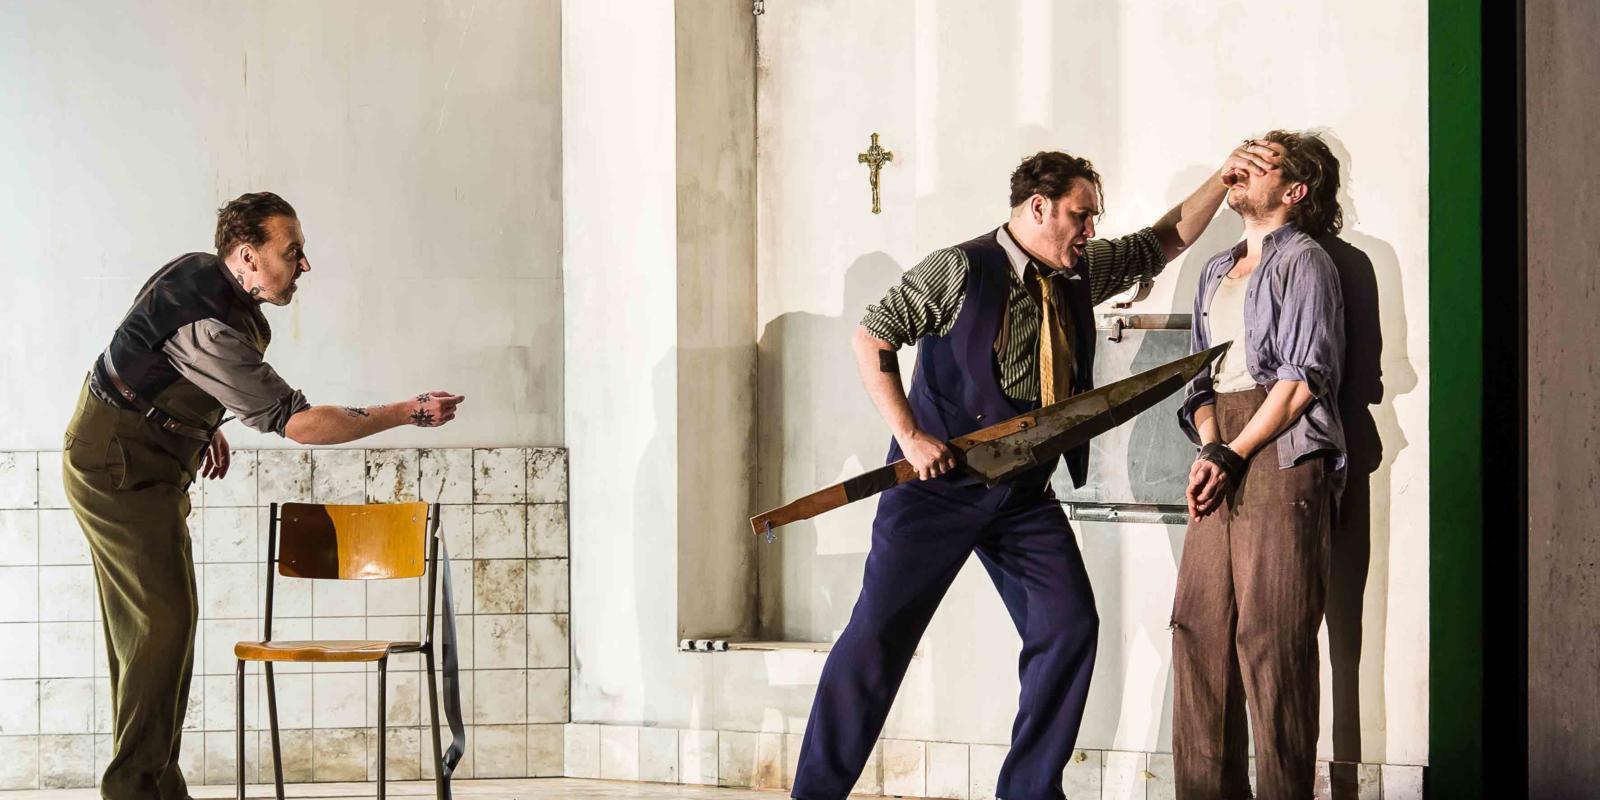 An image of Richard Burkhard, John Mark Ainsley and Iestyn Davies in Richard Jones's 2014 production of Rodelinda